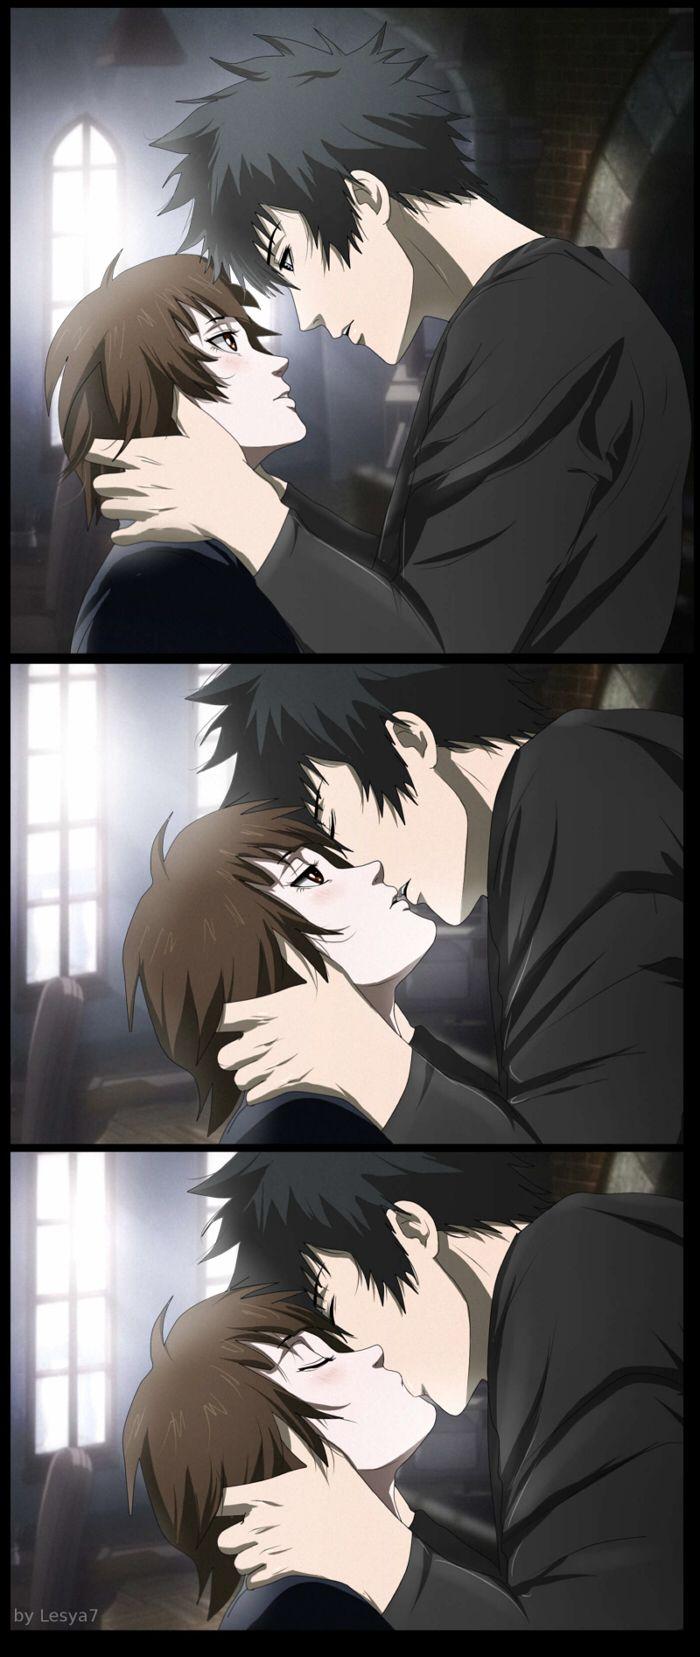 Psycho-pass 2: Kogami x Akane: A kiss by Lesya7.deviantart.com on @deviantART